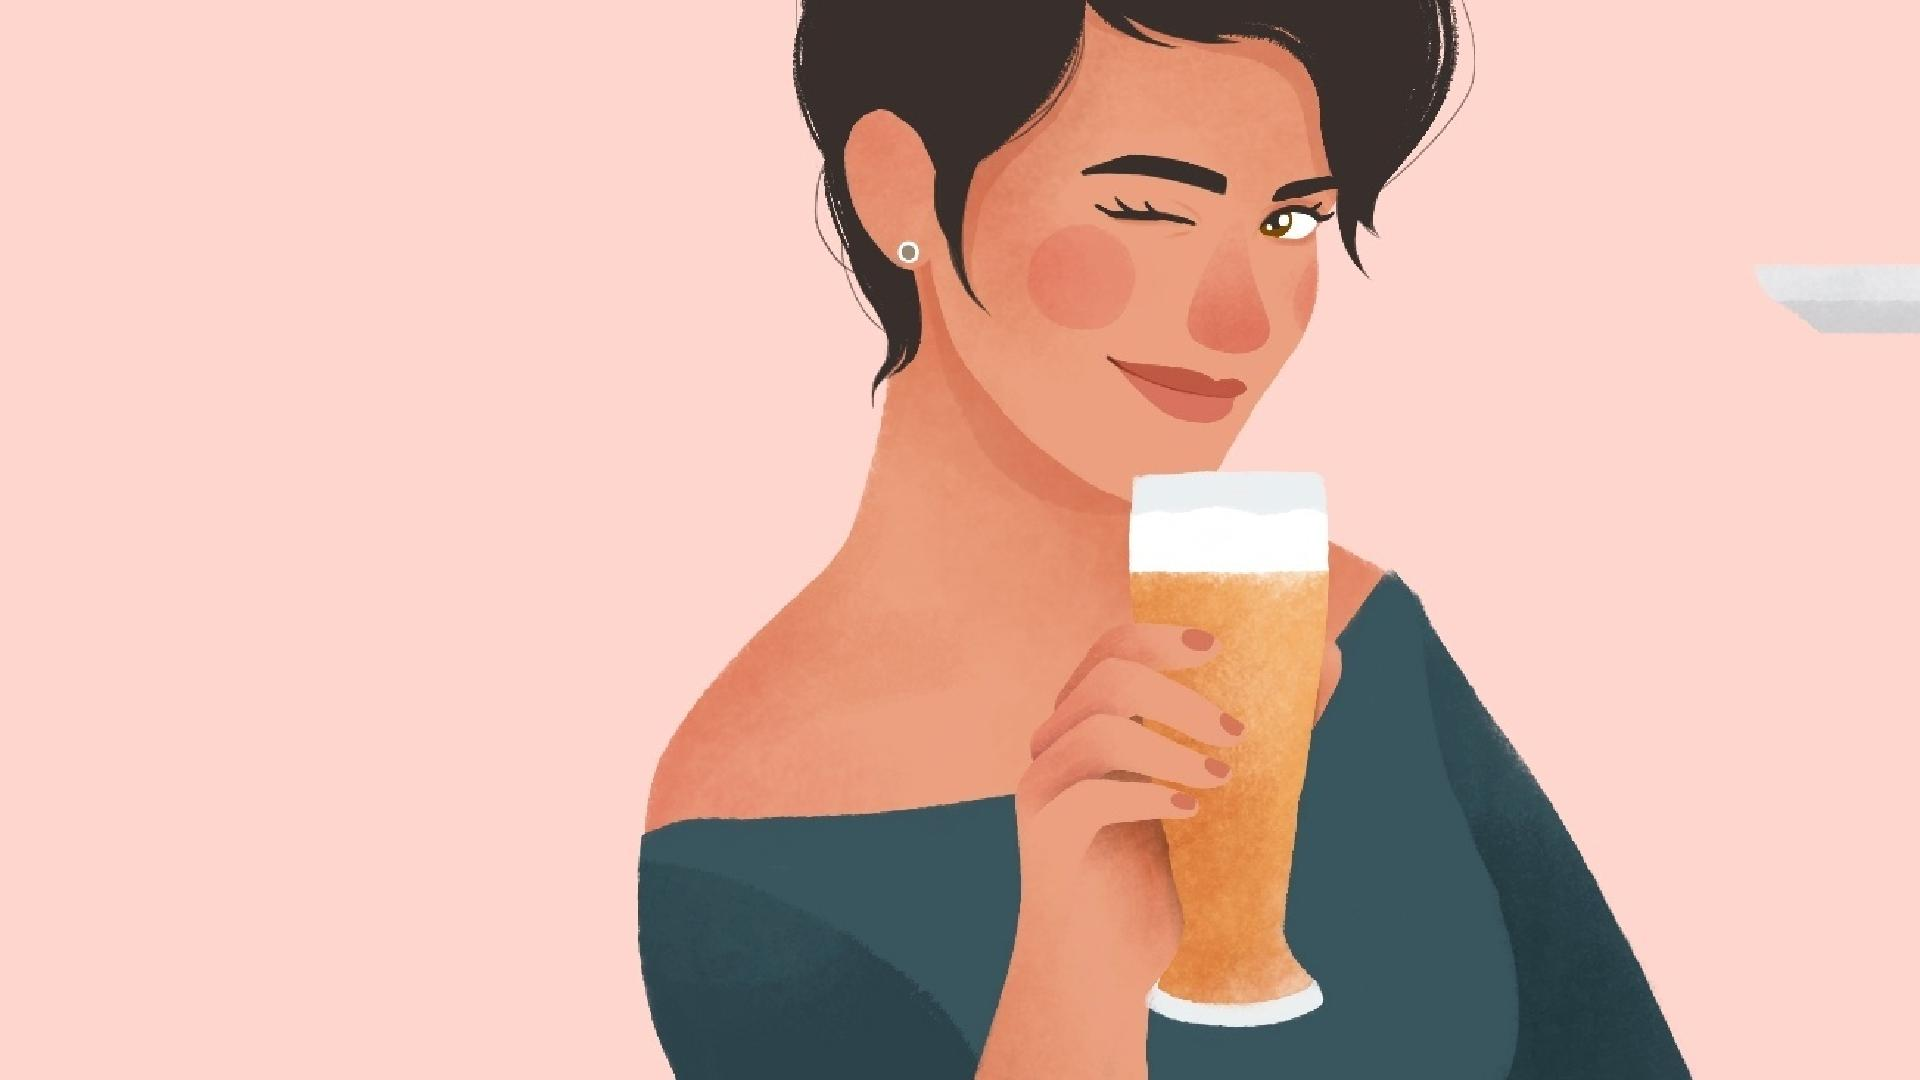 Tomar Cerveja Evita Pedra Nos Rins 30012019 Uol Vivabem